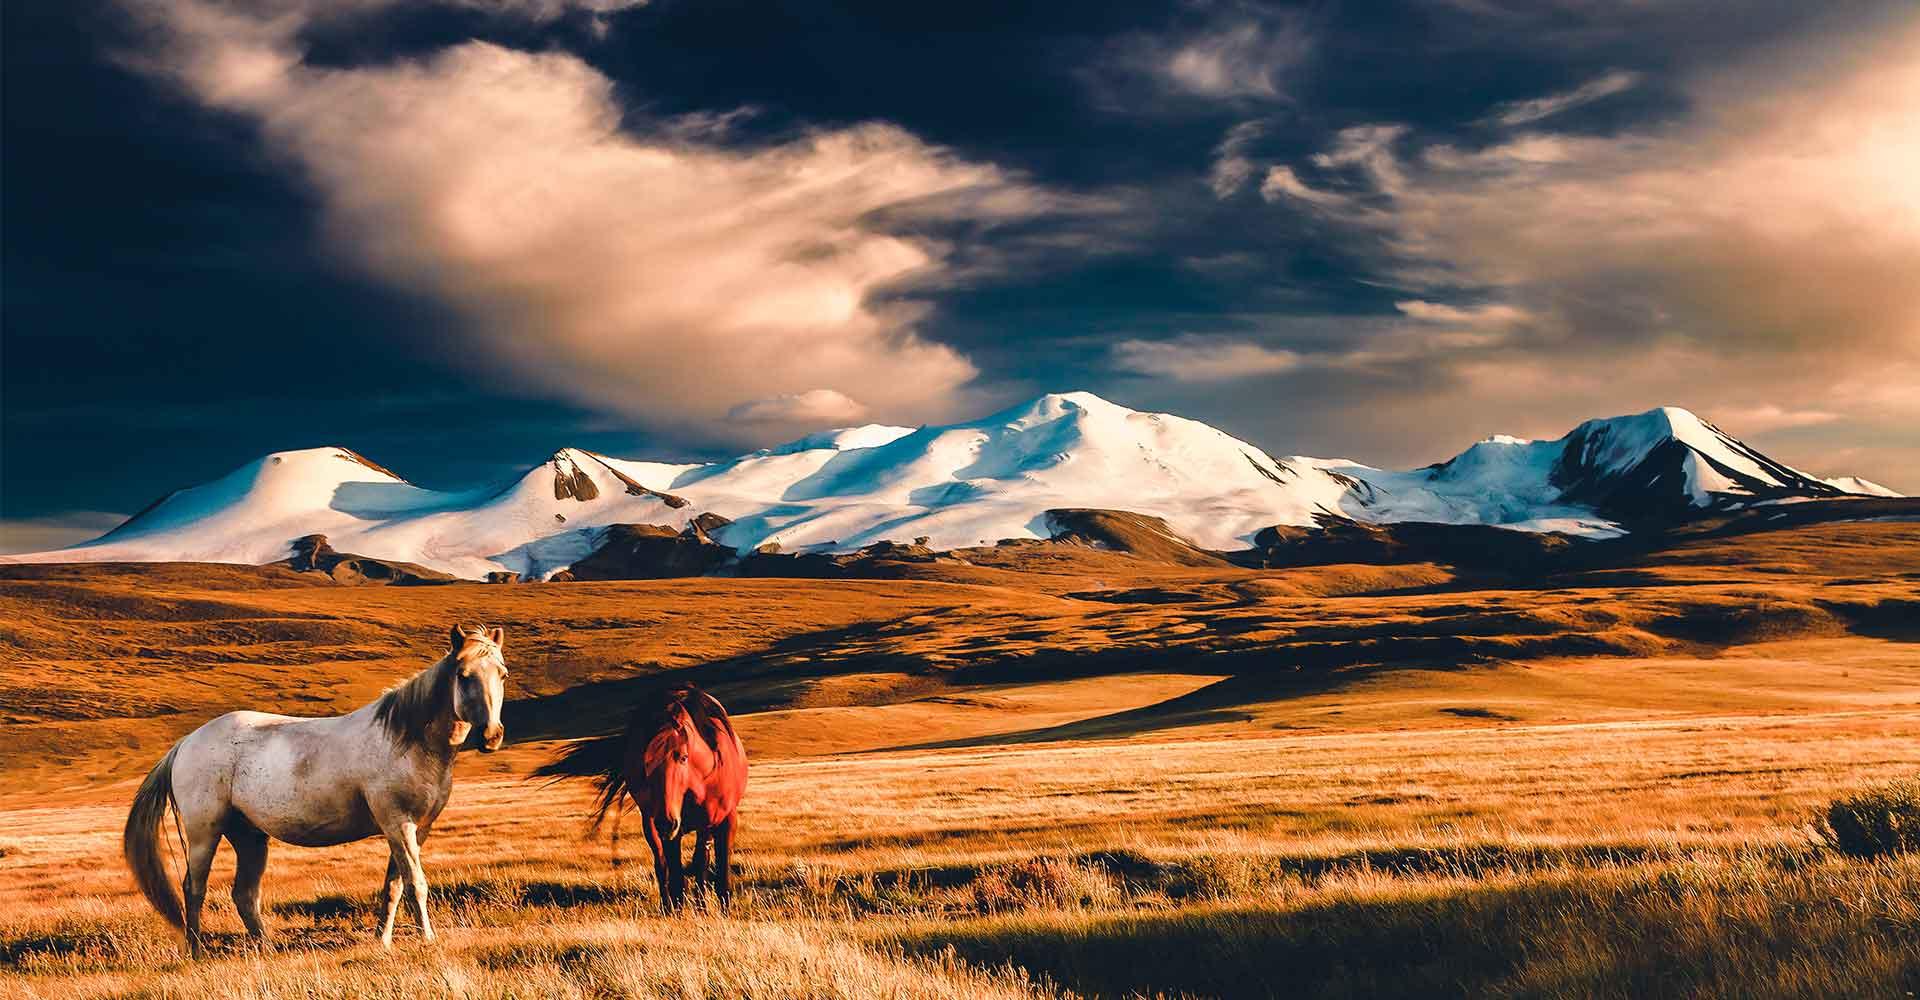 Banner image of Mongolia